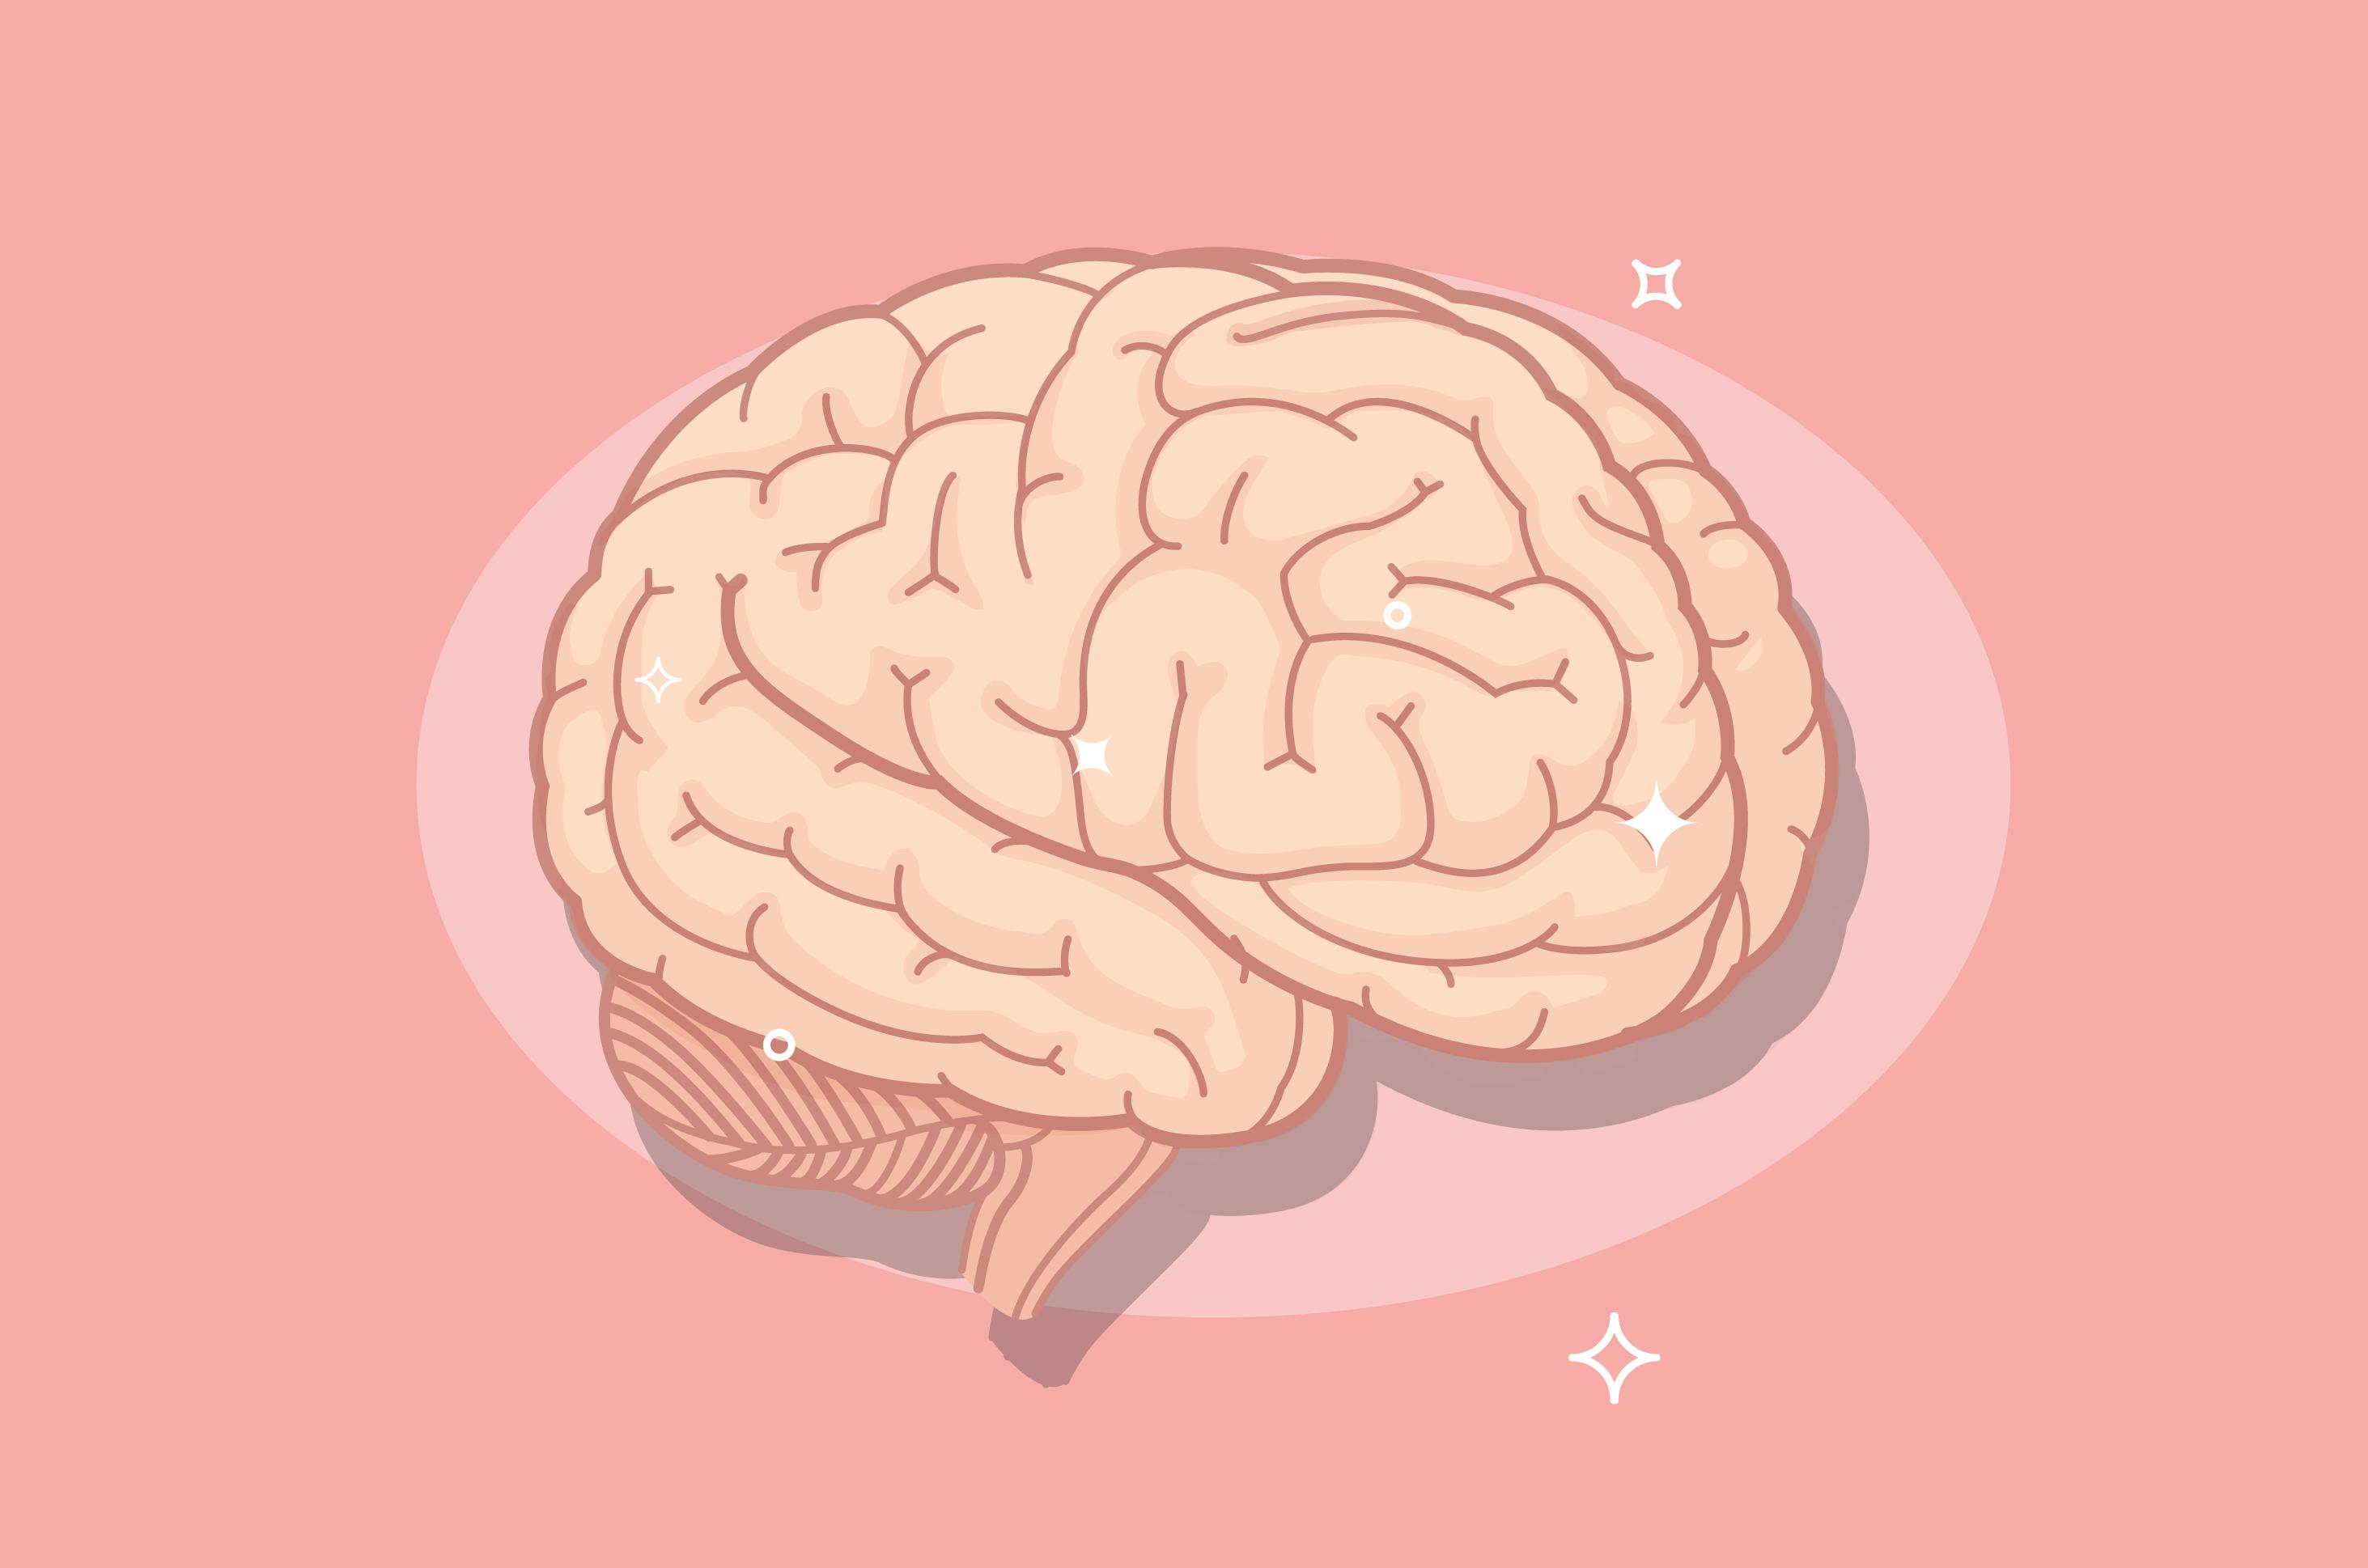 Makanan Pengaruhi Ukuran Otak, Benarkah?